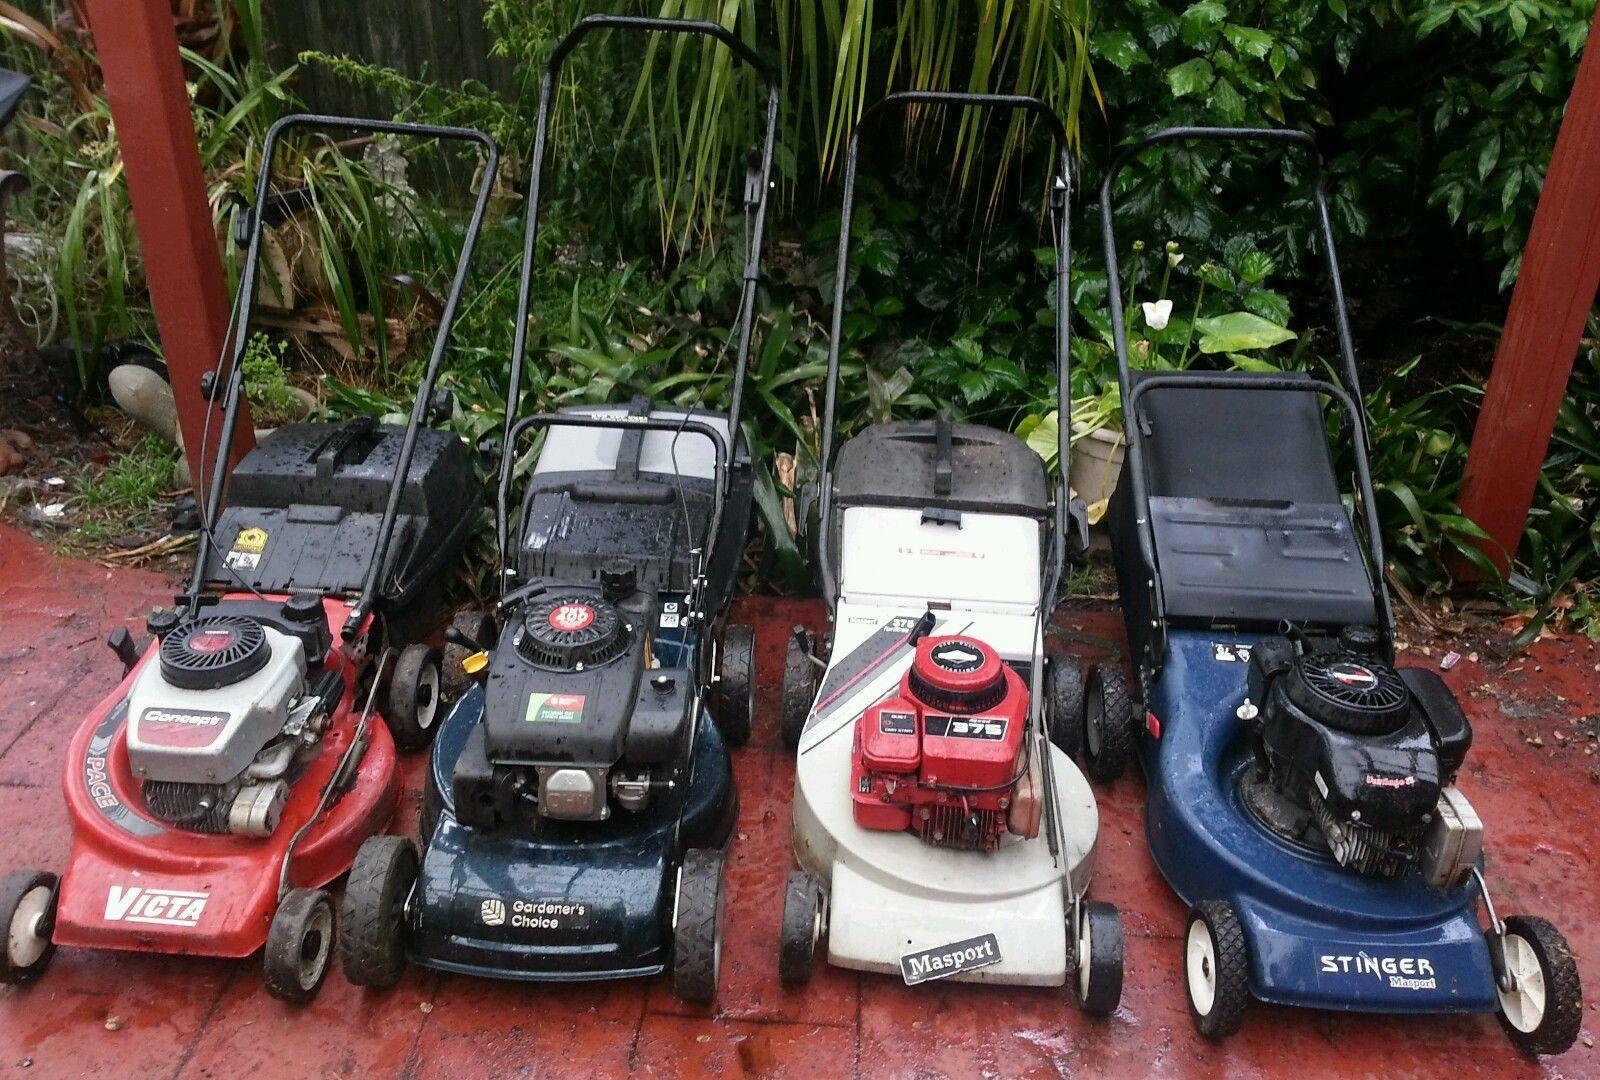 Outdoor Power Equipment Battle: Masport vs Victa